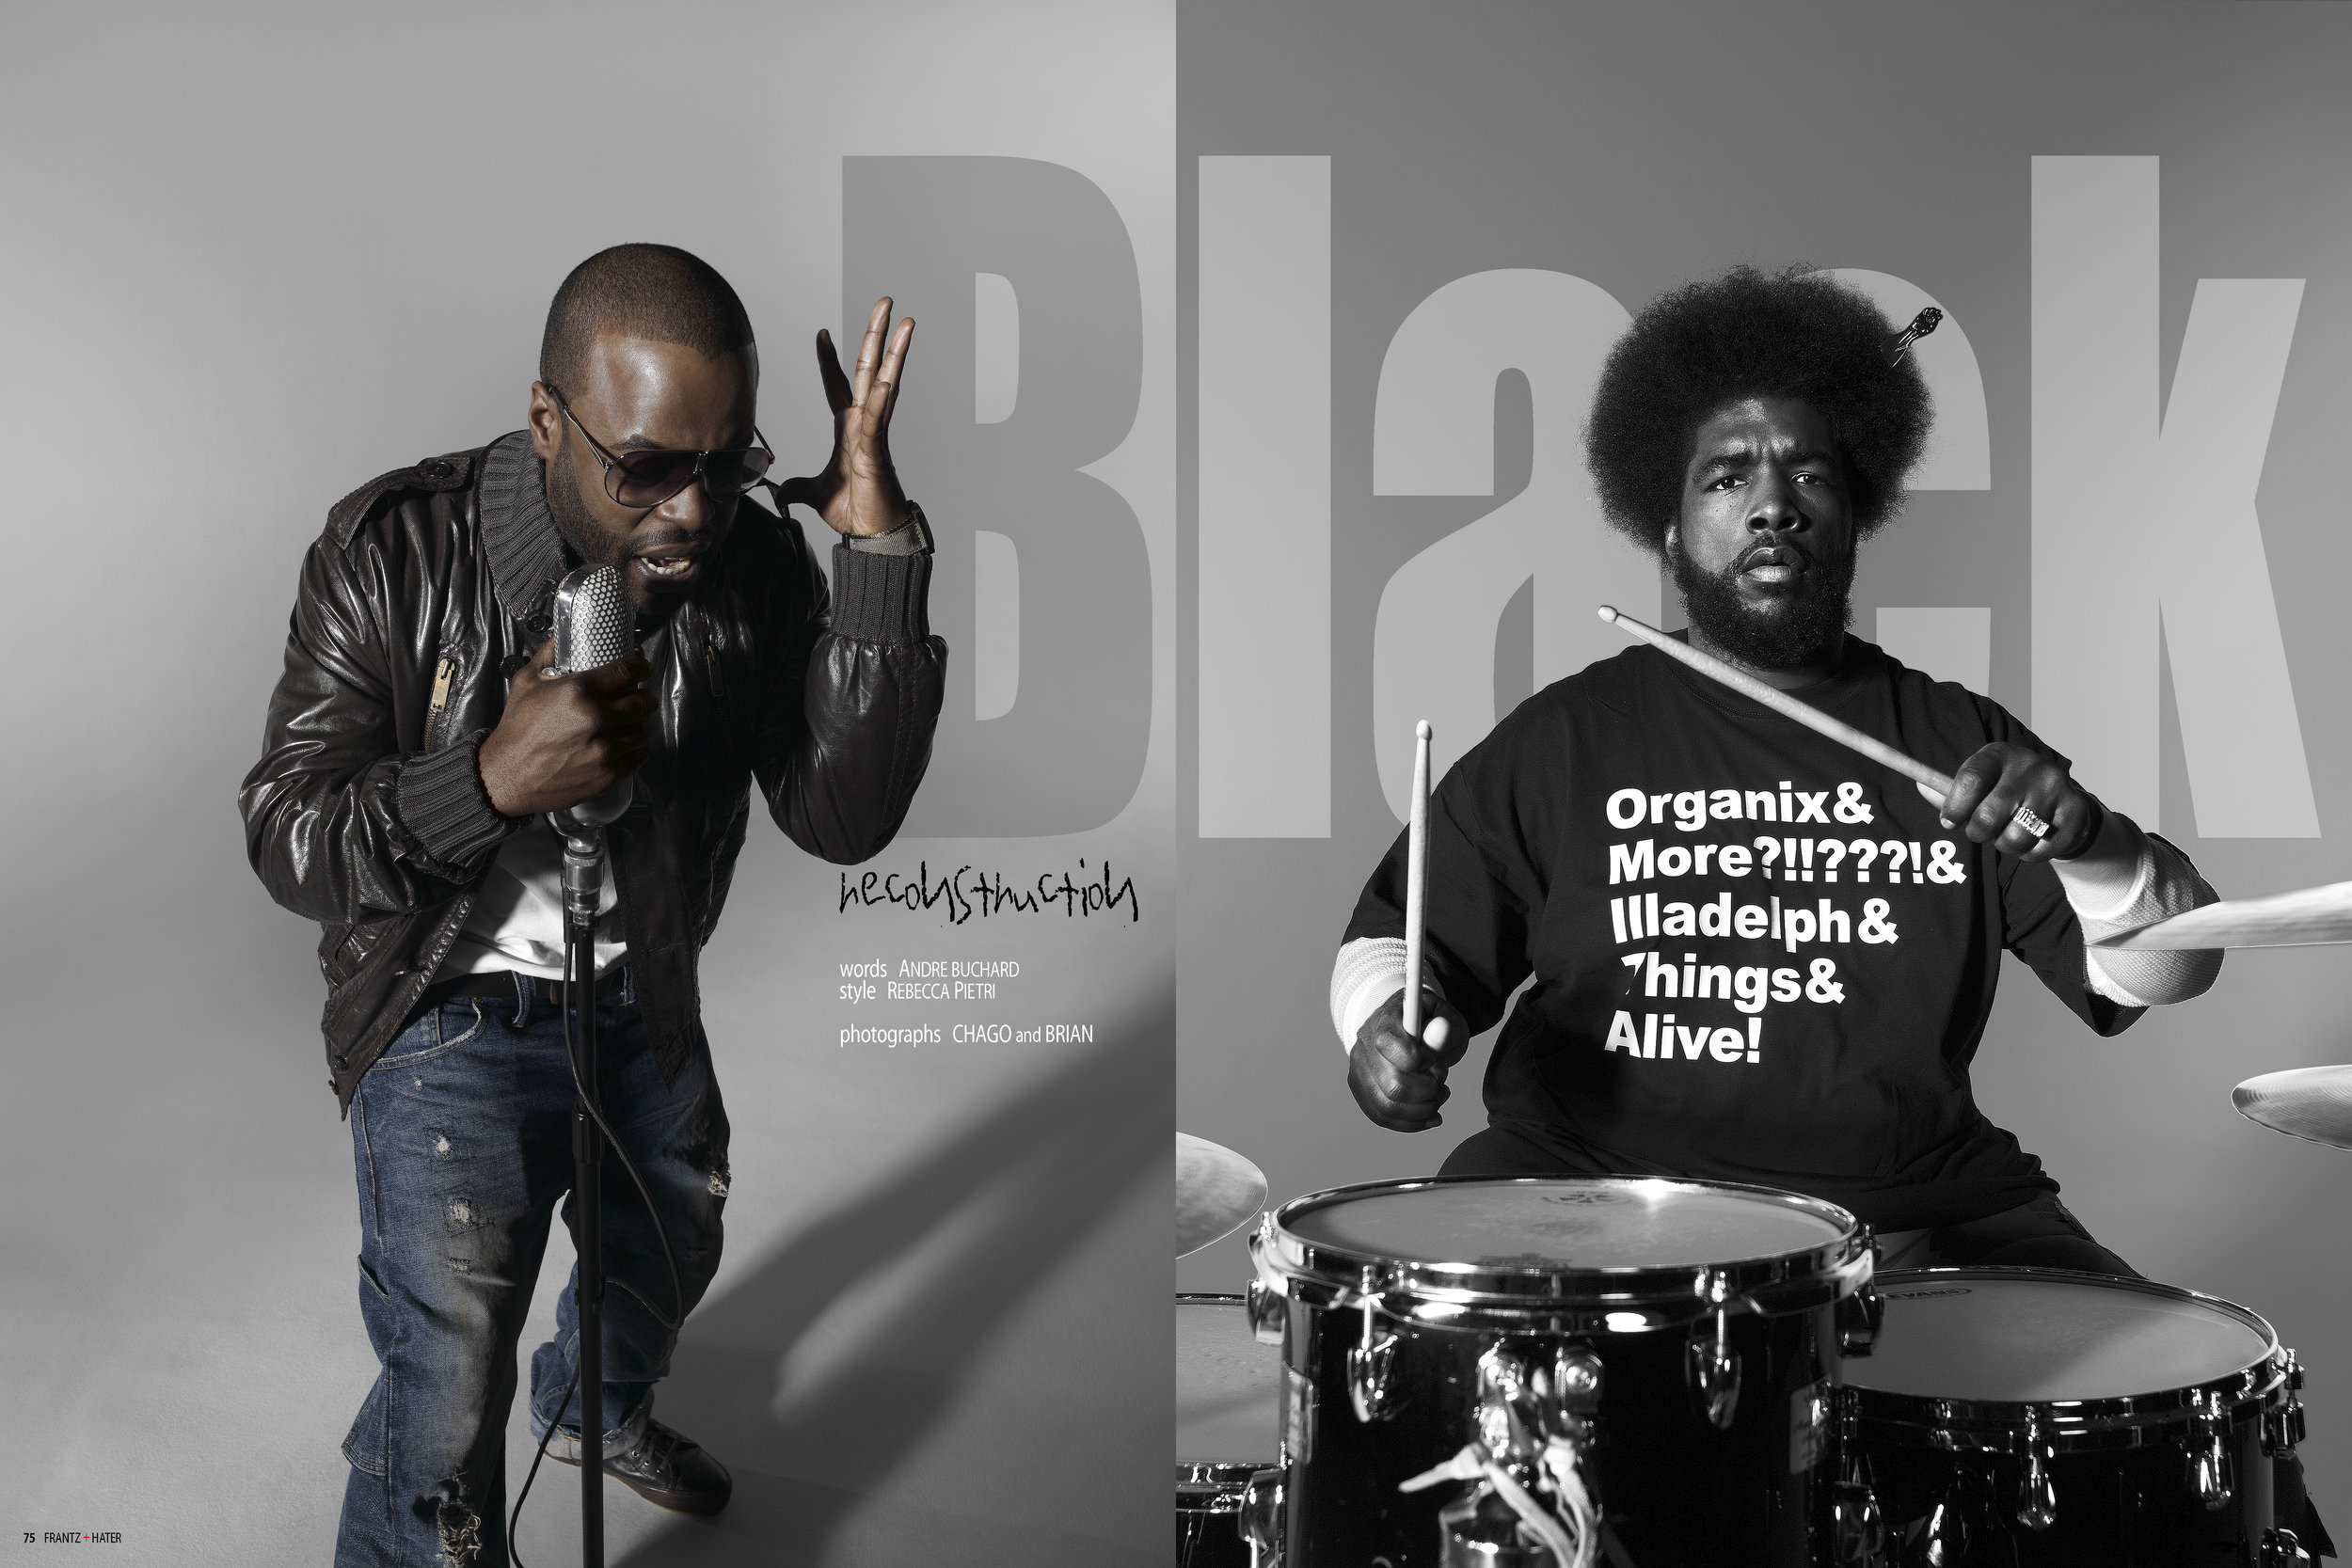 The Roots _Chago & Brian Photographers_ Rebecca Pietri Stylist_Rebecca Pietri Art Director_ Questlove_ Black Thought .jpg